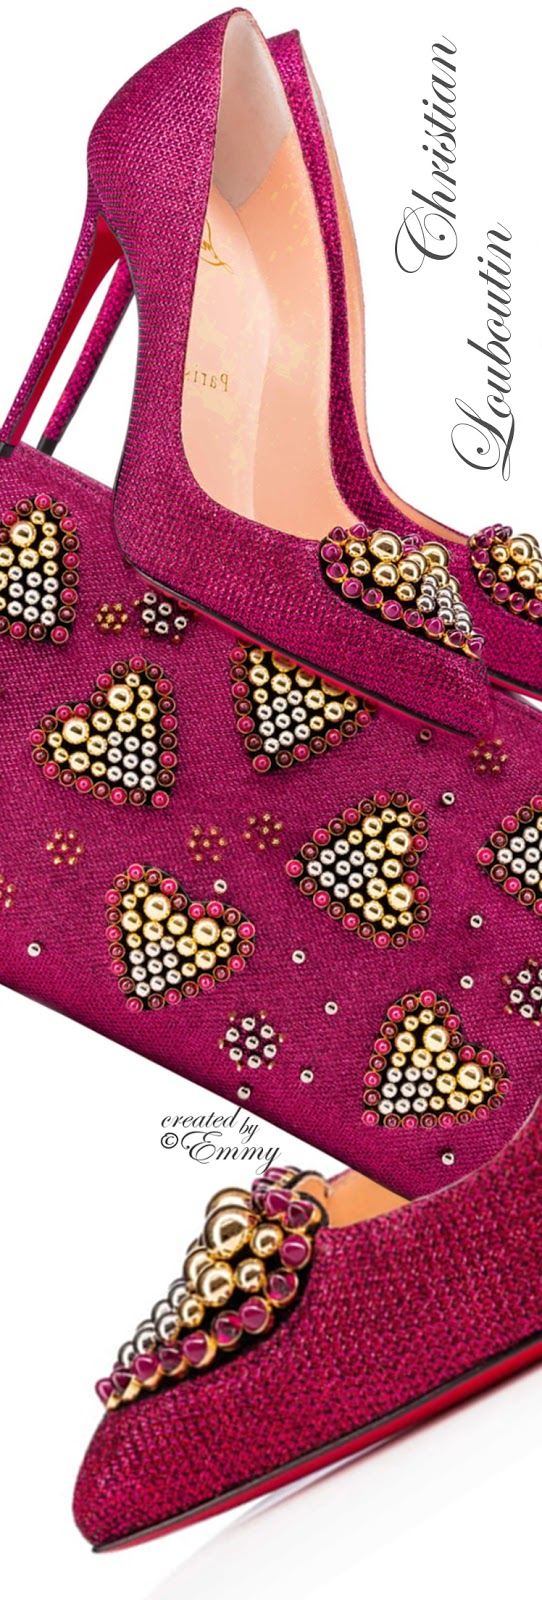 Brilliant Luxury ♦ Christian Louboutin Coralta Mia Glitter Tisse-Veau Velours & Loubiposh Clutch